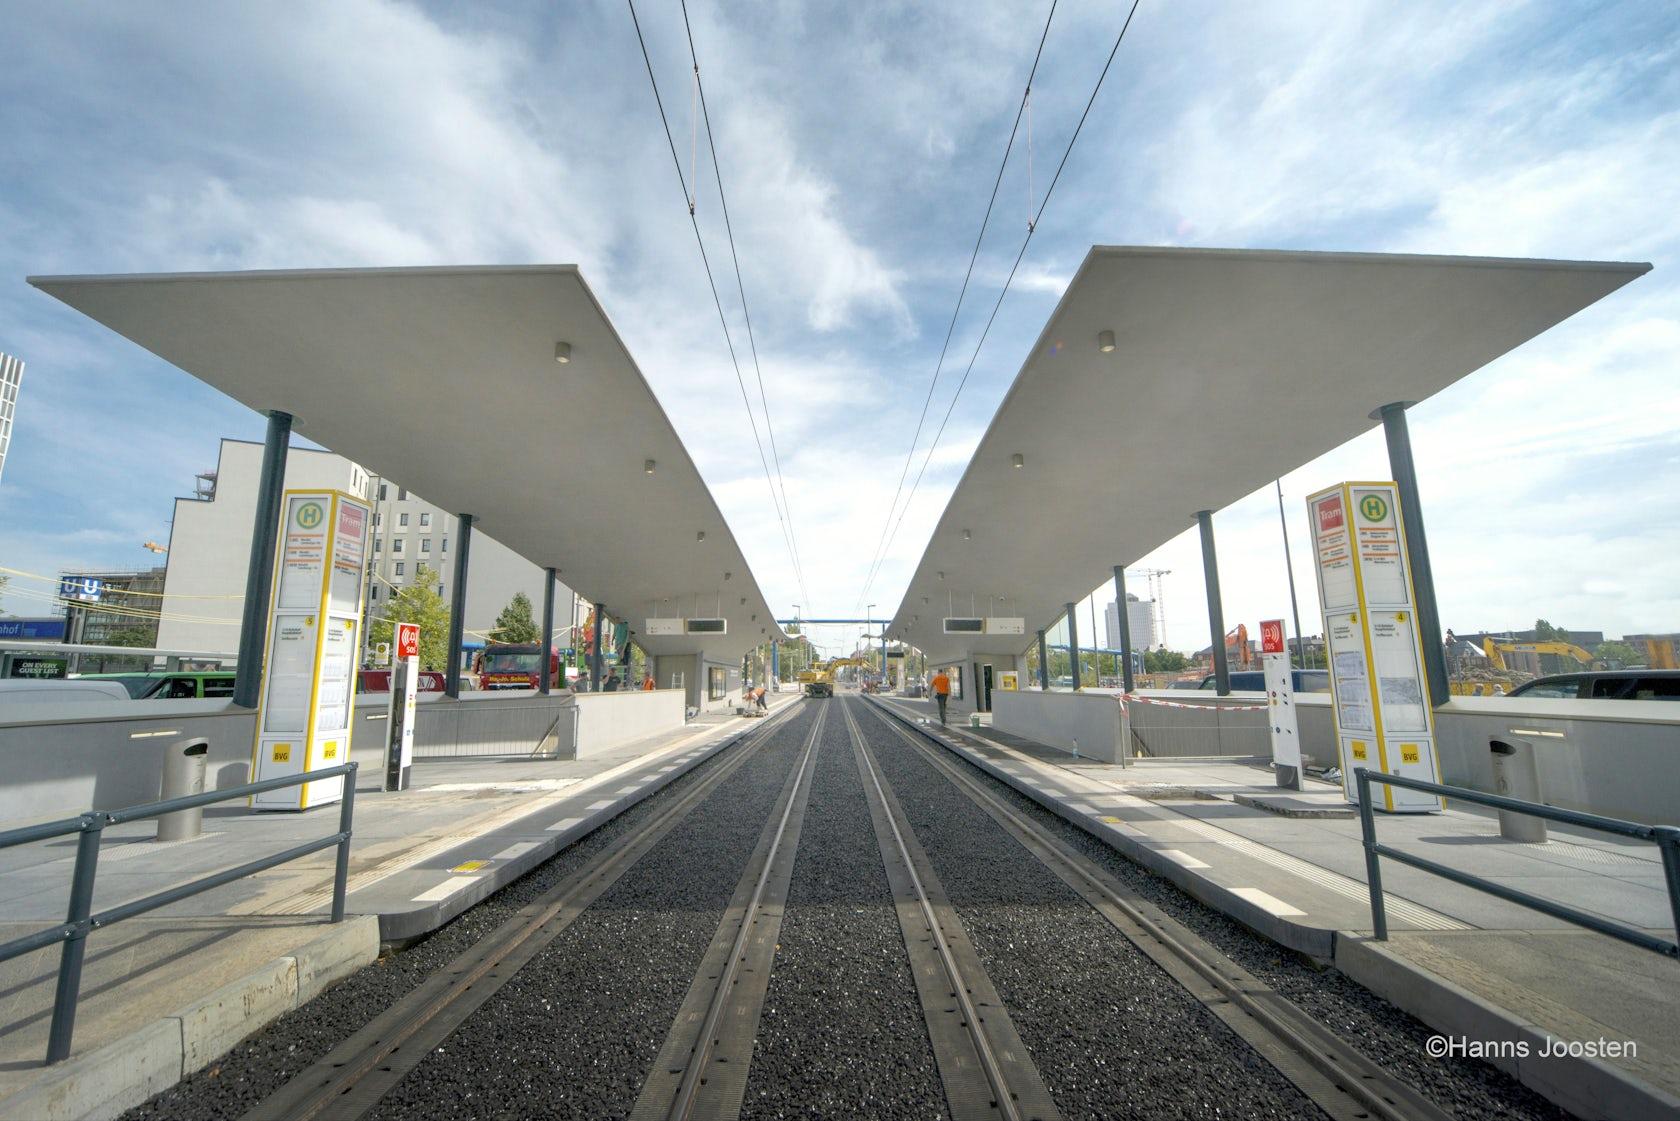 tram stop europaplatz berlin main train station architizer. Black Bedroom Furniture Sets. Home Design Ideas